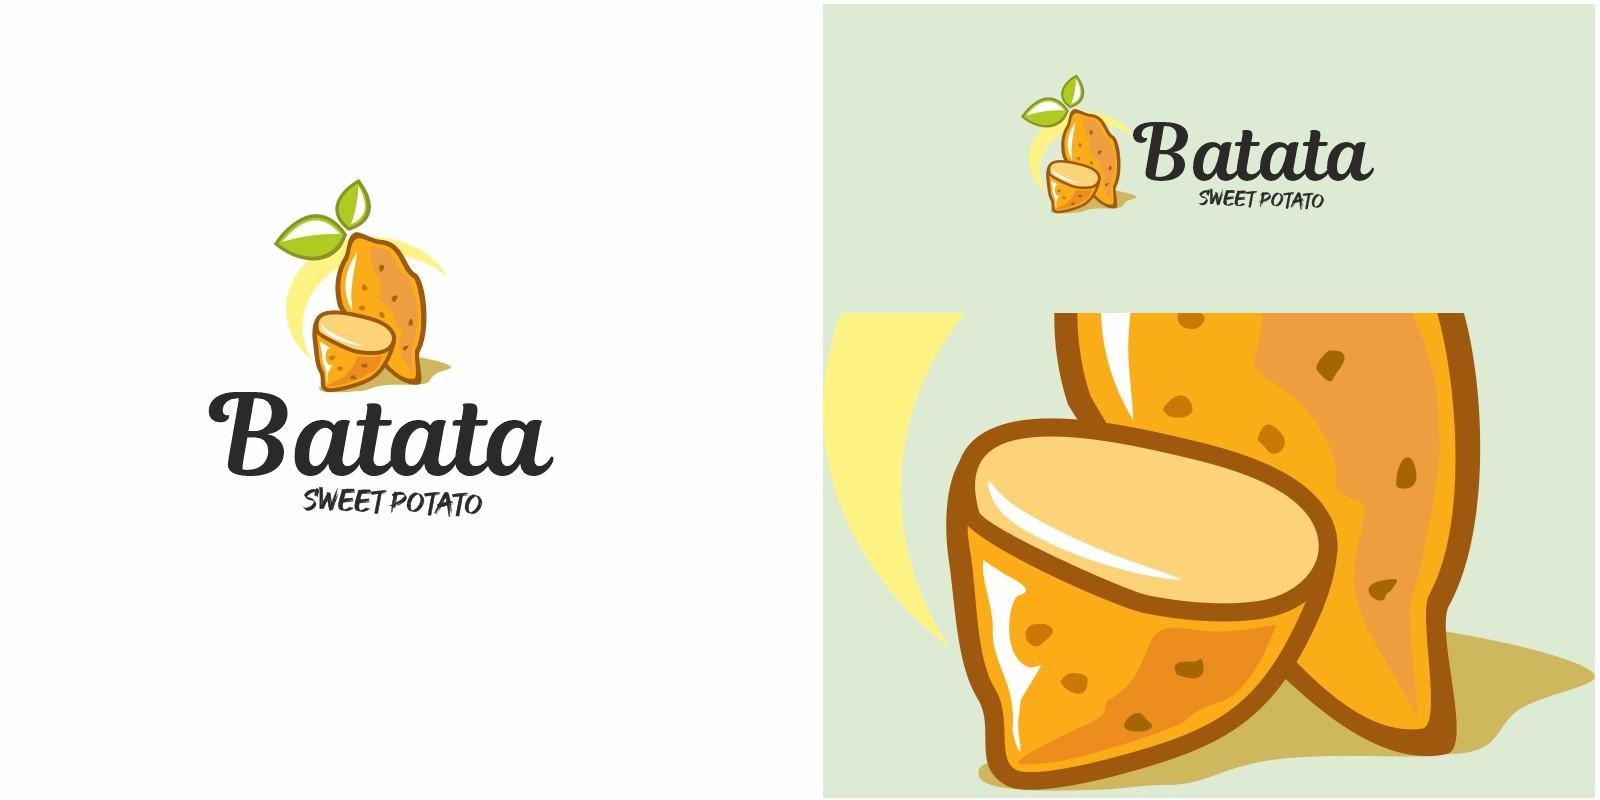 Batata Sweet Potato Logo